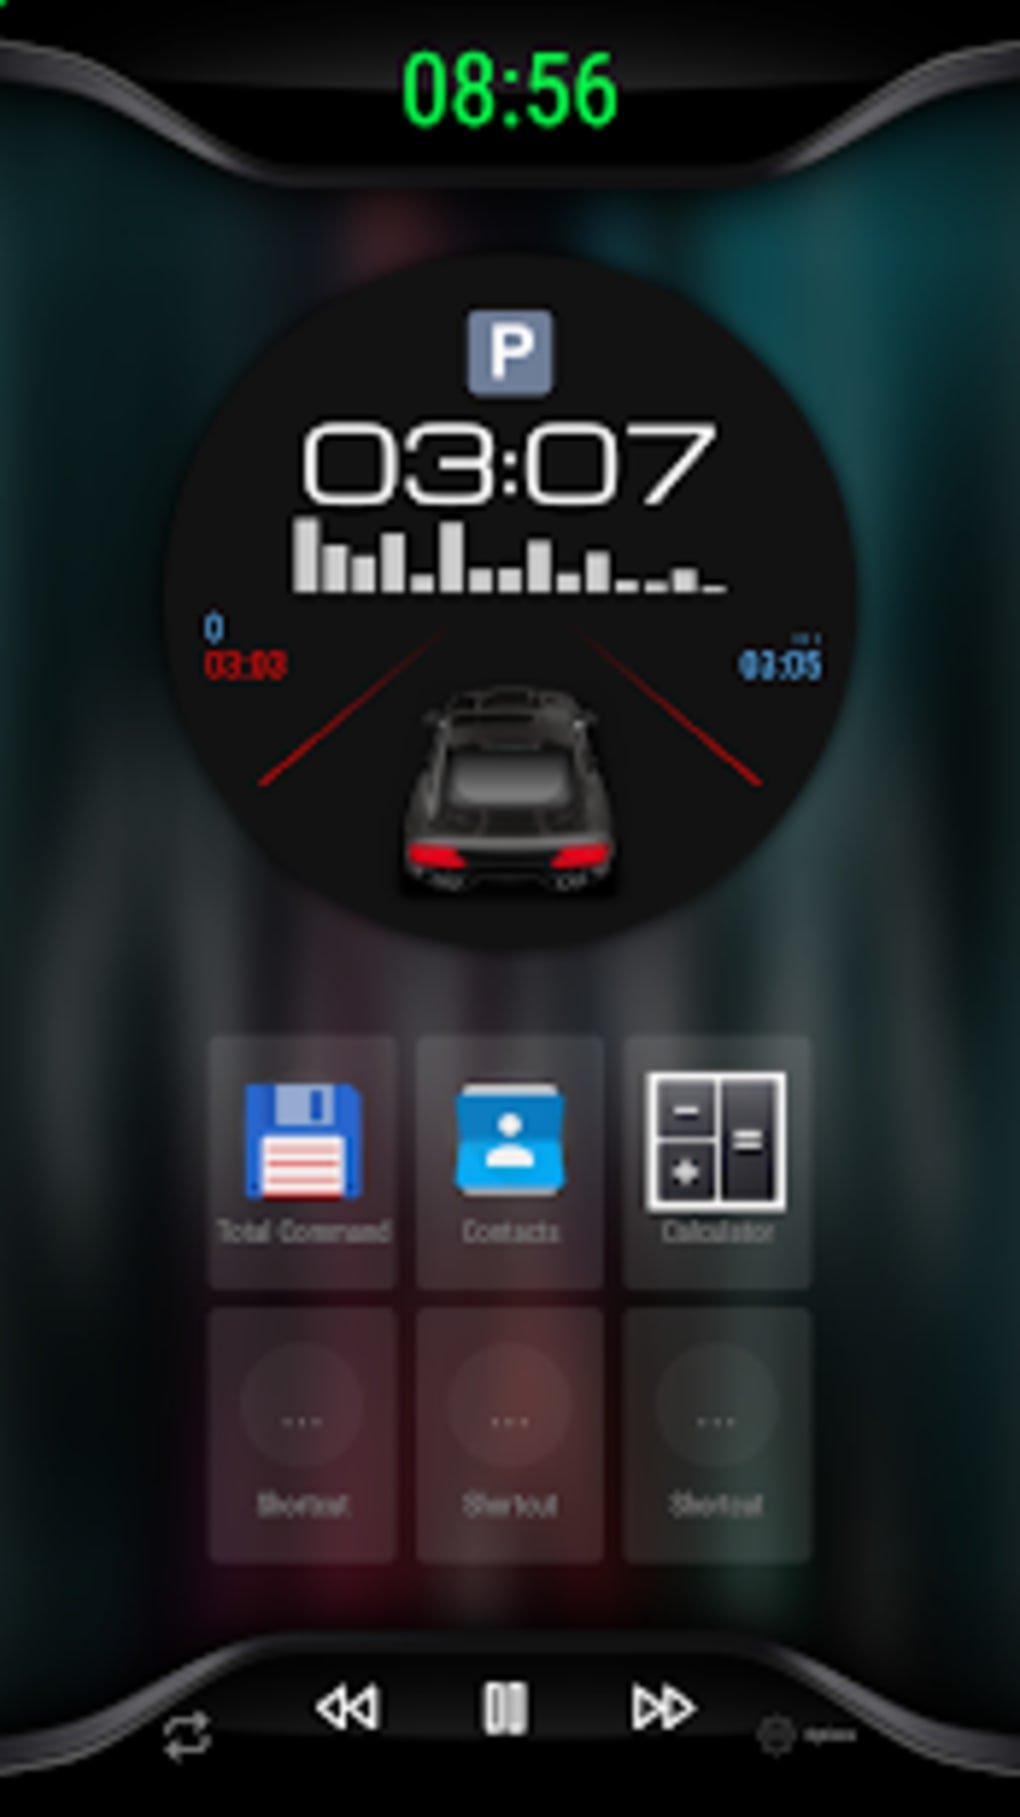 Black V3 - theme for CarWebGuru Launcher for Android - Download